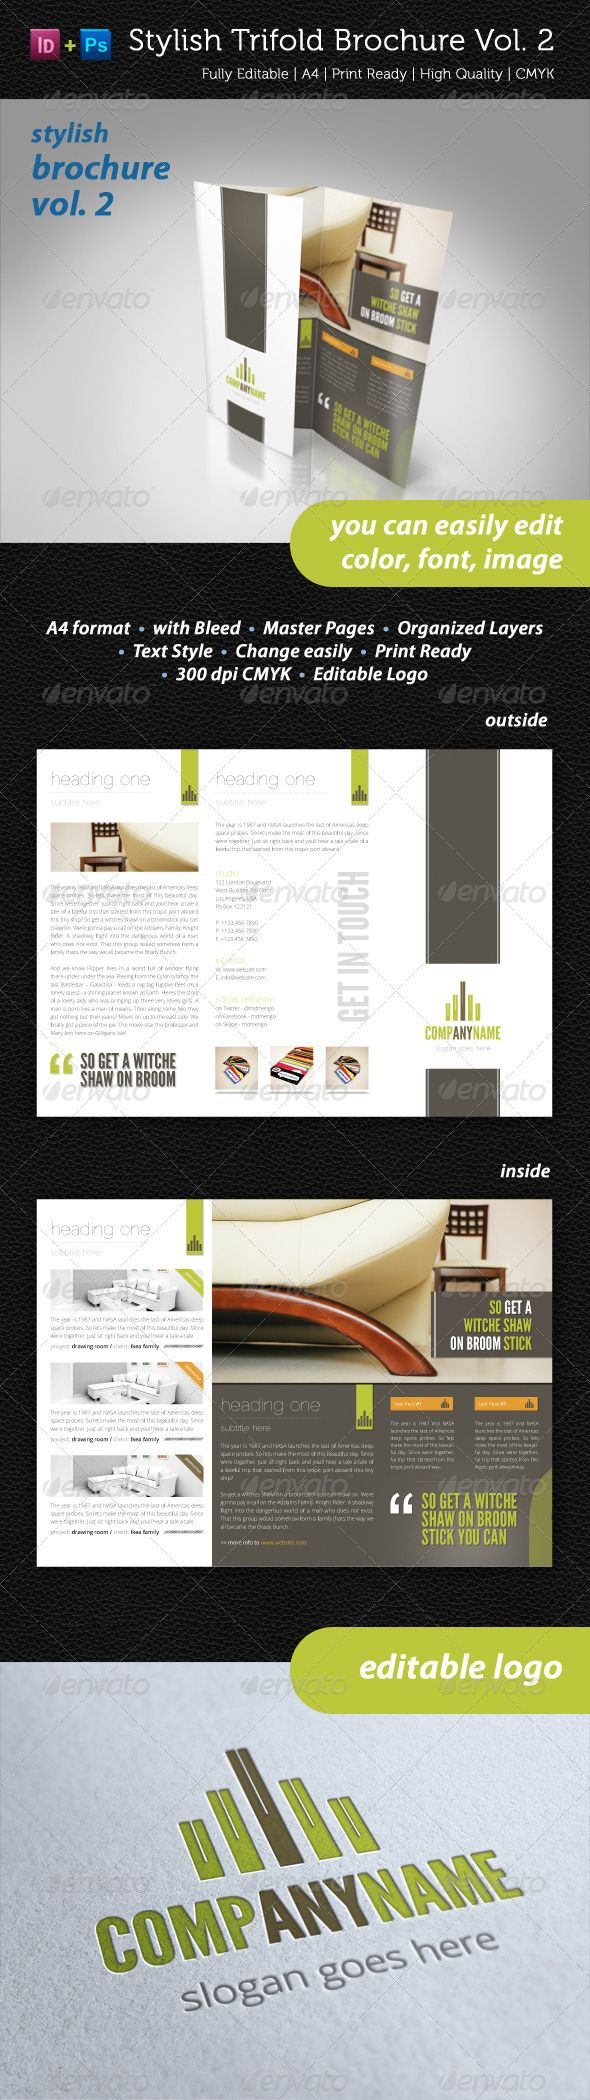 15 best images about brochure design on Pinterest